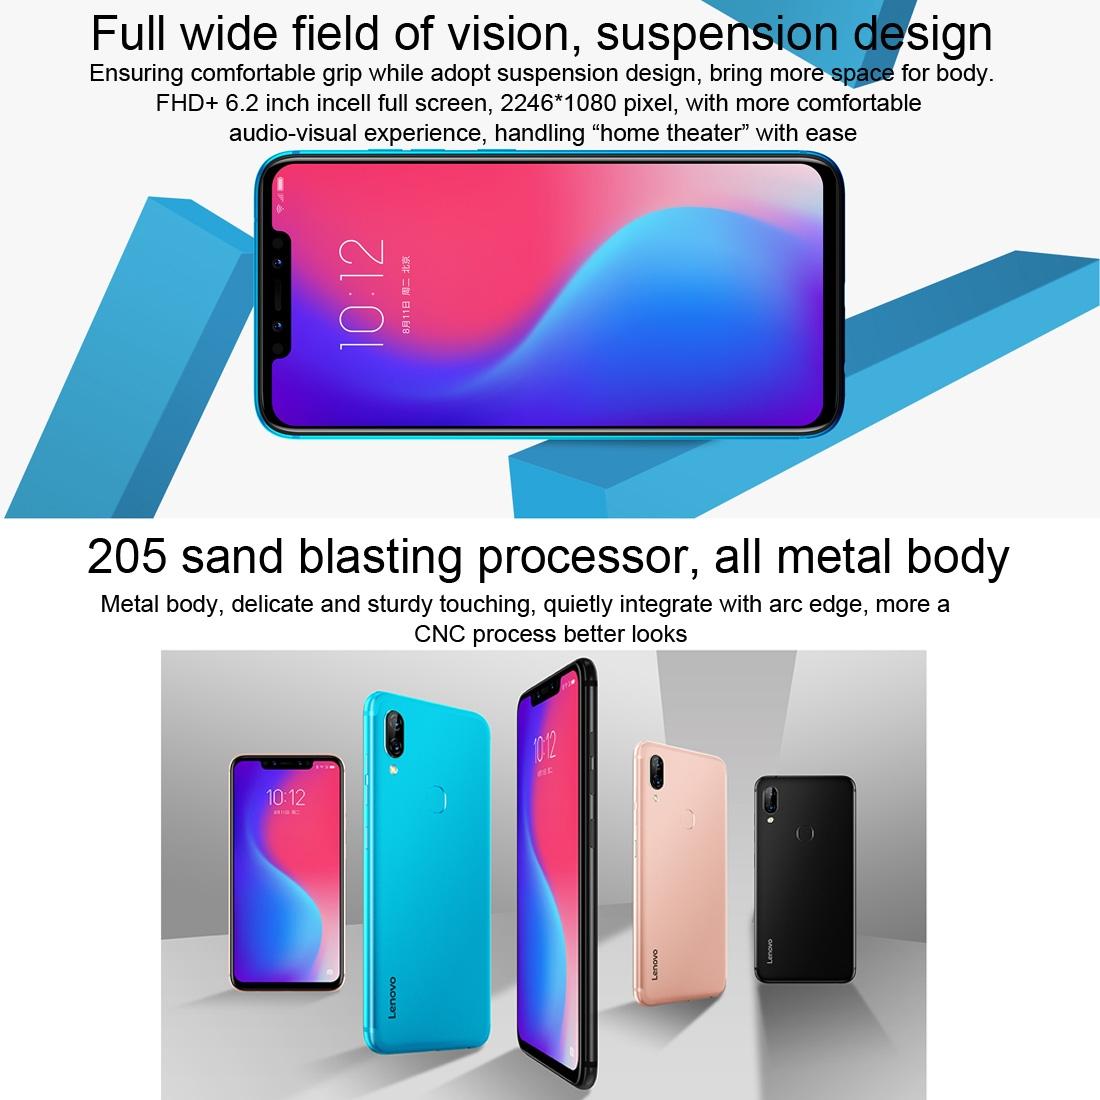 i.ibb.co/JvfDSJ8/Smartphone-Celular-6-GB-RAM-64-GB-ROM-Lenovo-S5-Pro-14.jpg